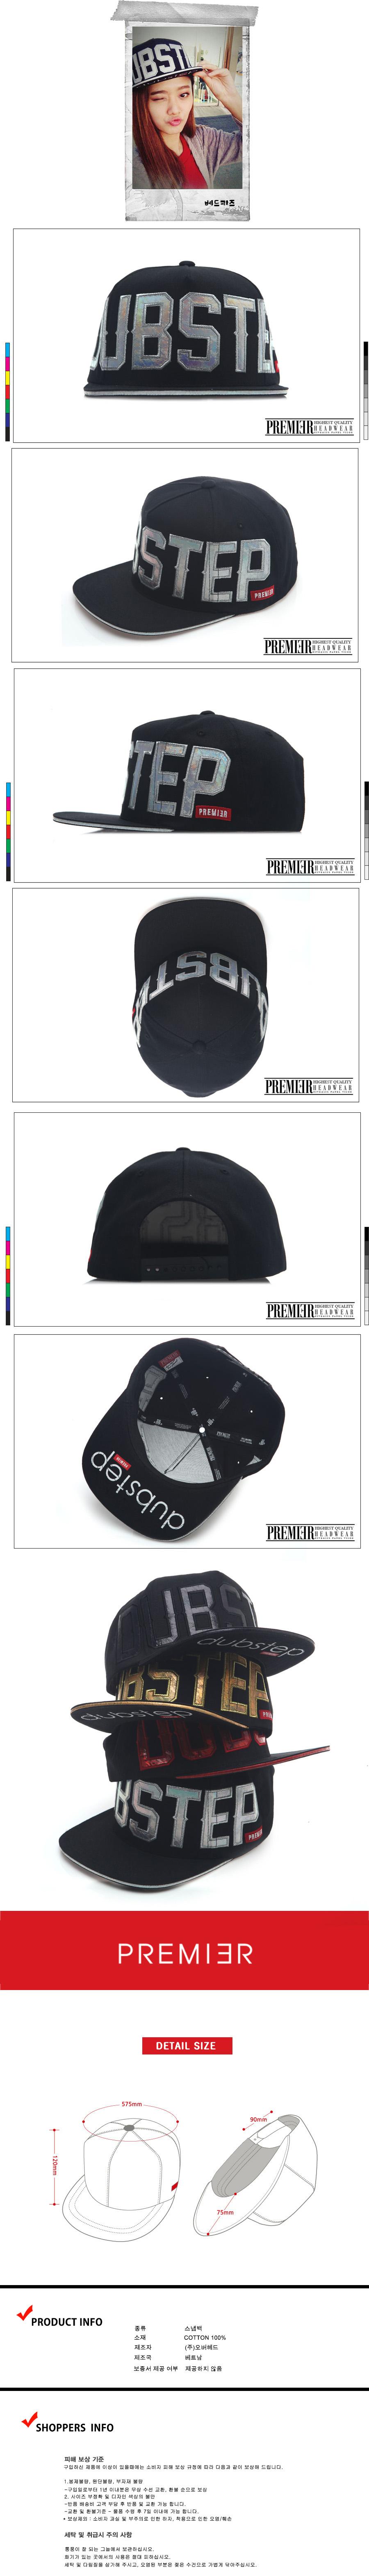 [ PREMIER ] [Premier] Snapback Dubstep Black/Silver